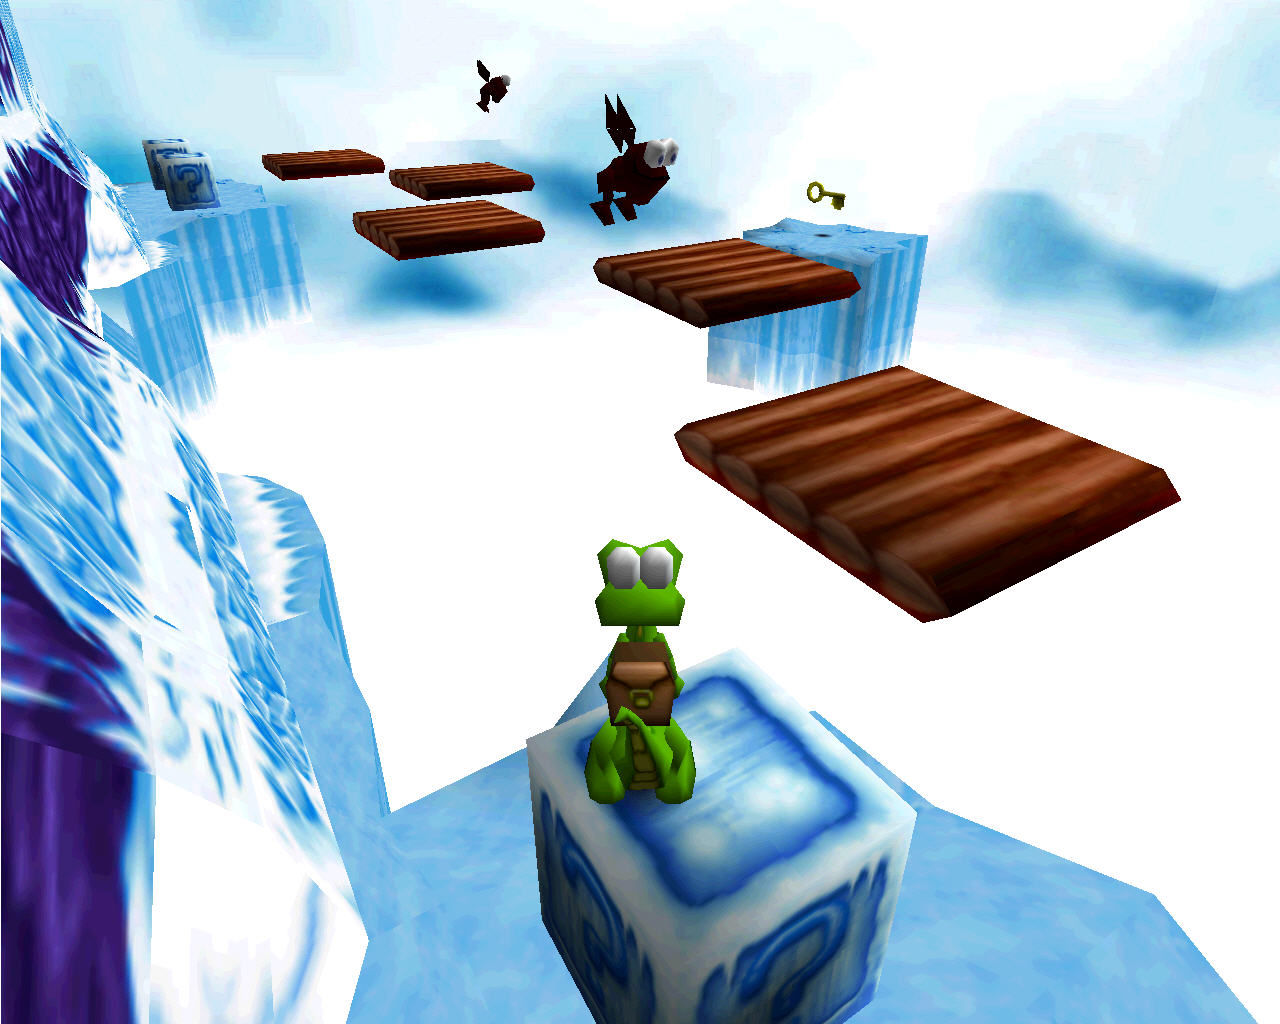 Monde de glace Croc : Legend of the Goboss